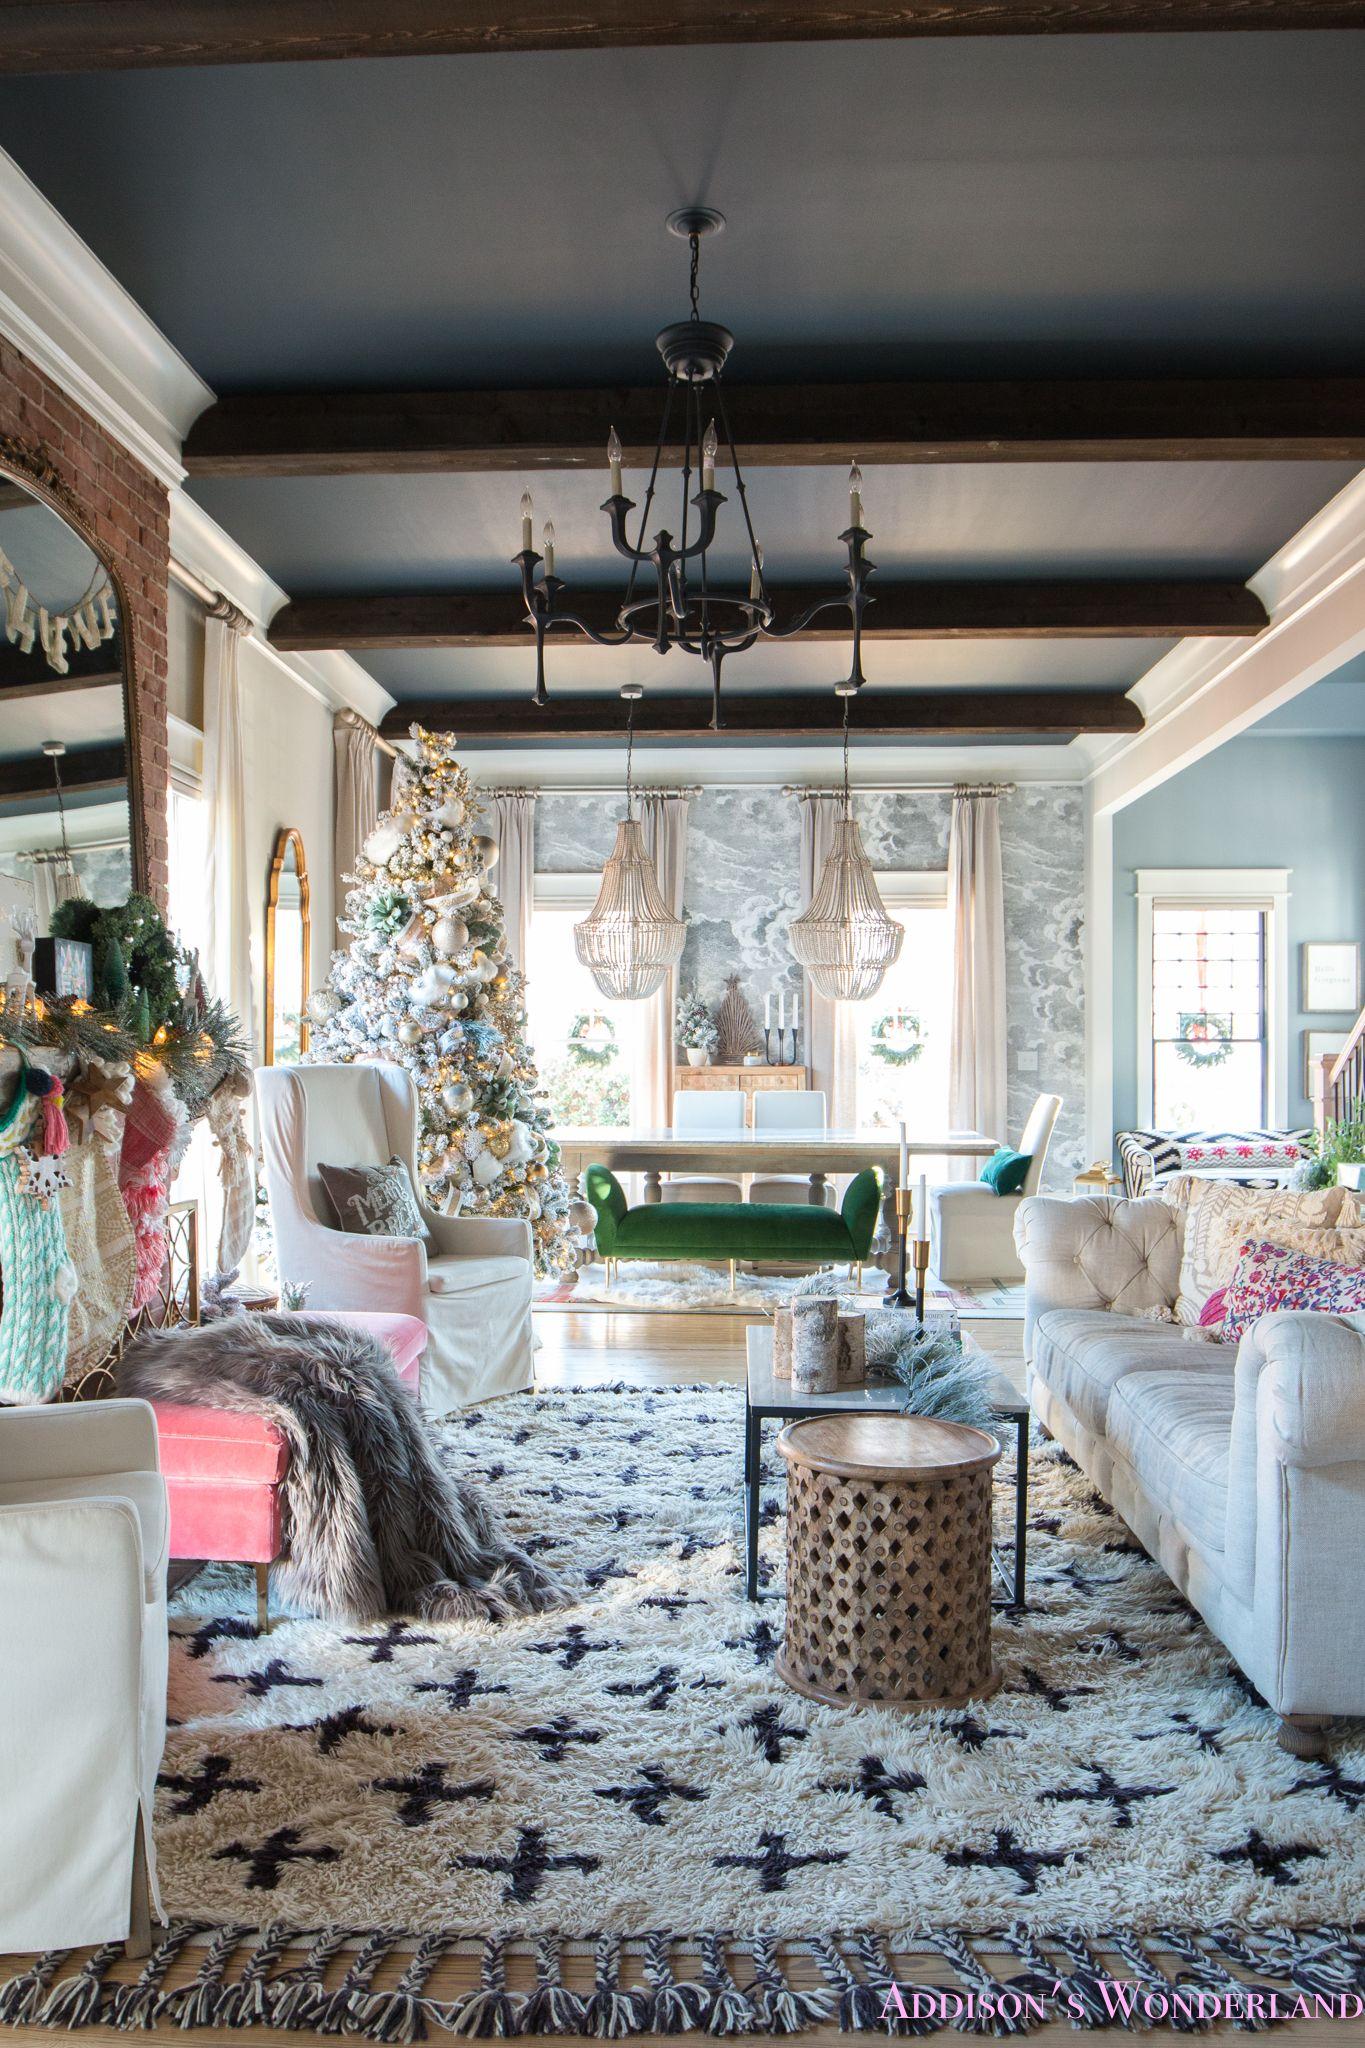 Our Whimsical Colorful Christmas Holiday Living Room Holiday Living Room Whimsical Living Room Home Decor Whimsical living room decor